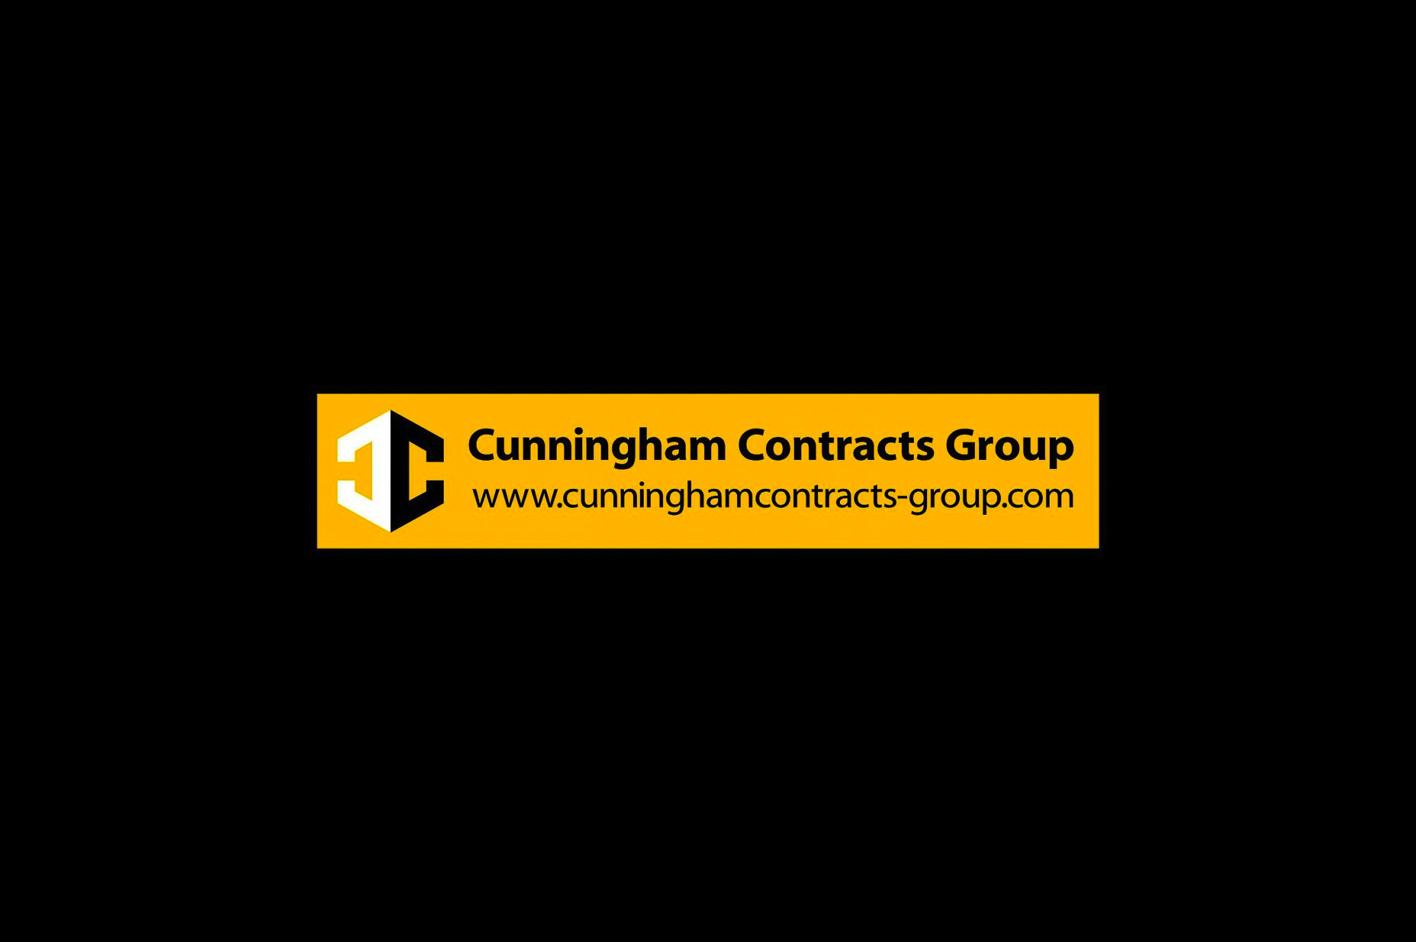 cunninham contracts website designers newry